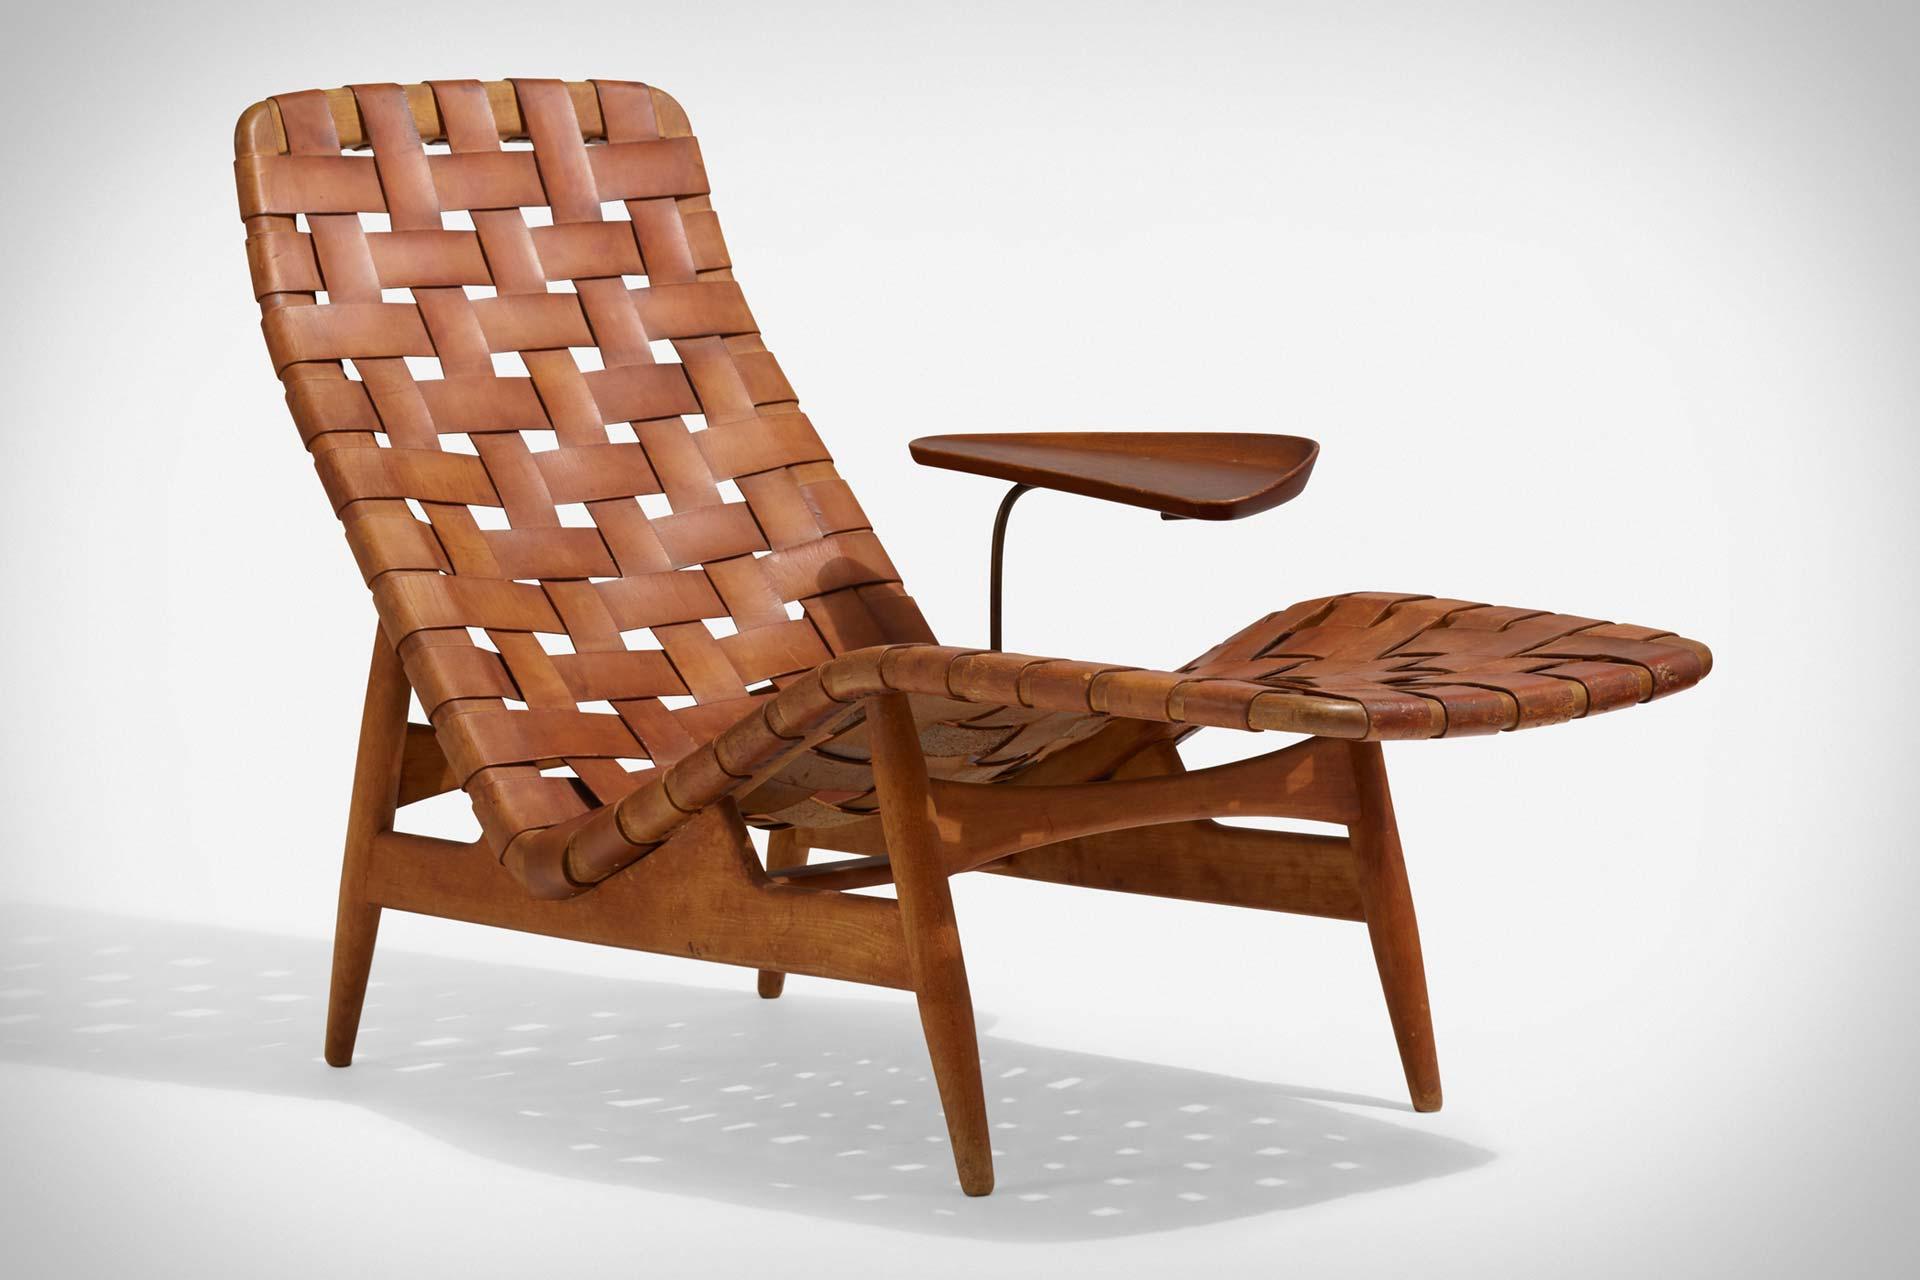 Arne Vodder Chaise Lounge